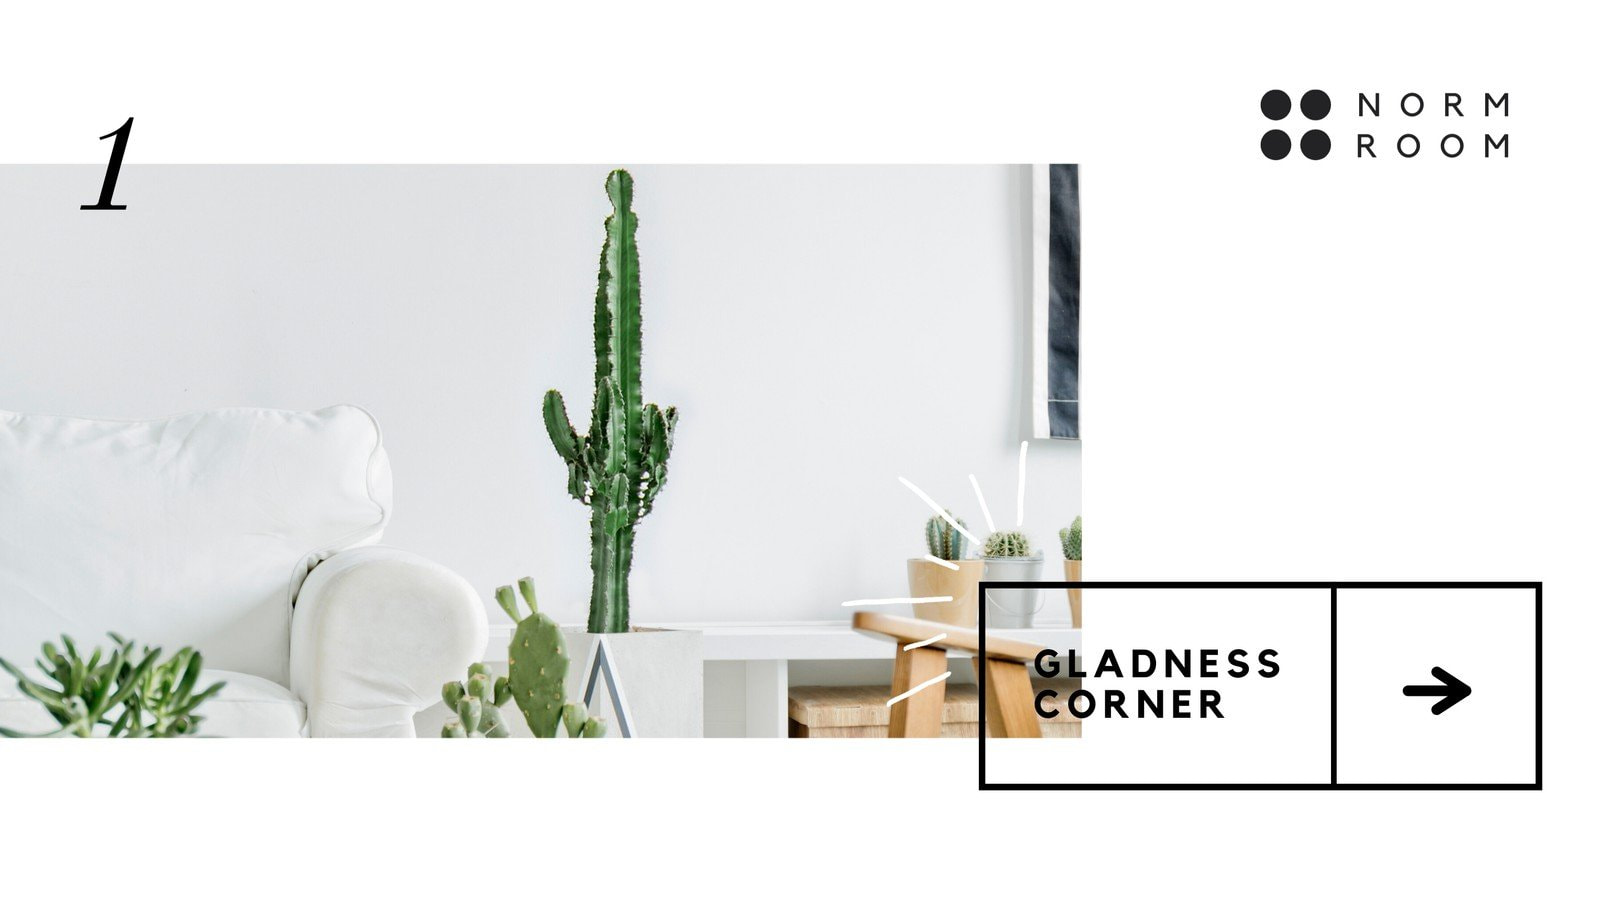 White and Black Minimalist Furniture/Houseware Facebook In-Stream Video Ad